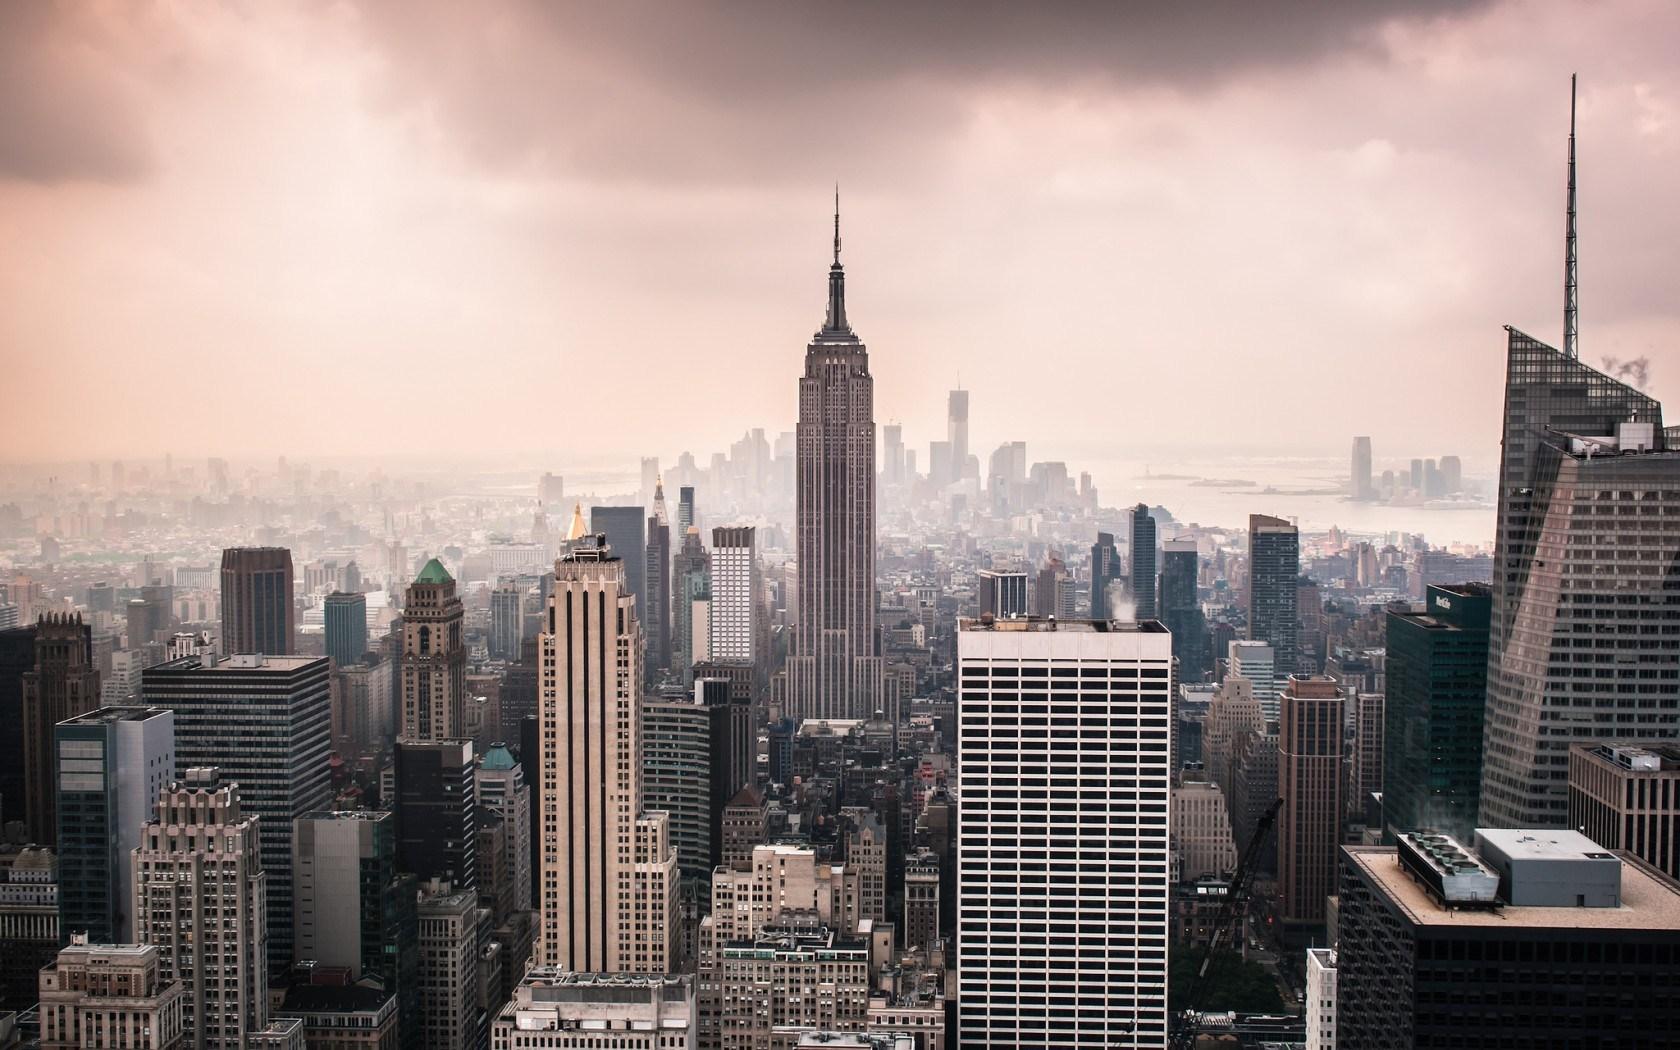 Hd new york city wallpaper wallpapersafari new york usa city towers photo skyline vintage hd voltagebd Images